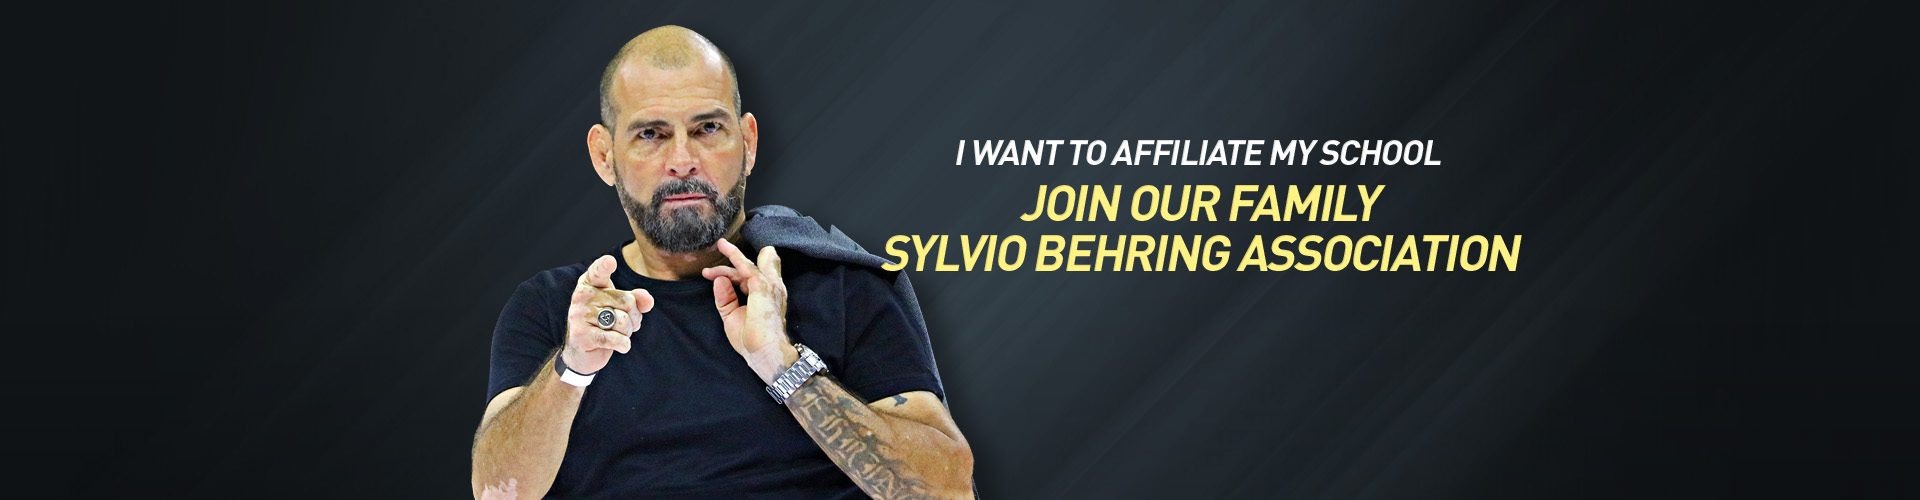 Header-I-want-to-affiliate-my-school-SBA-EN